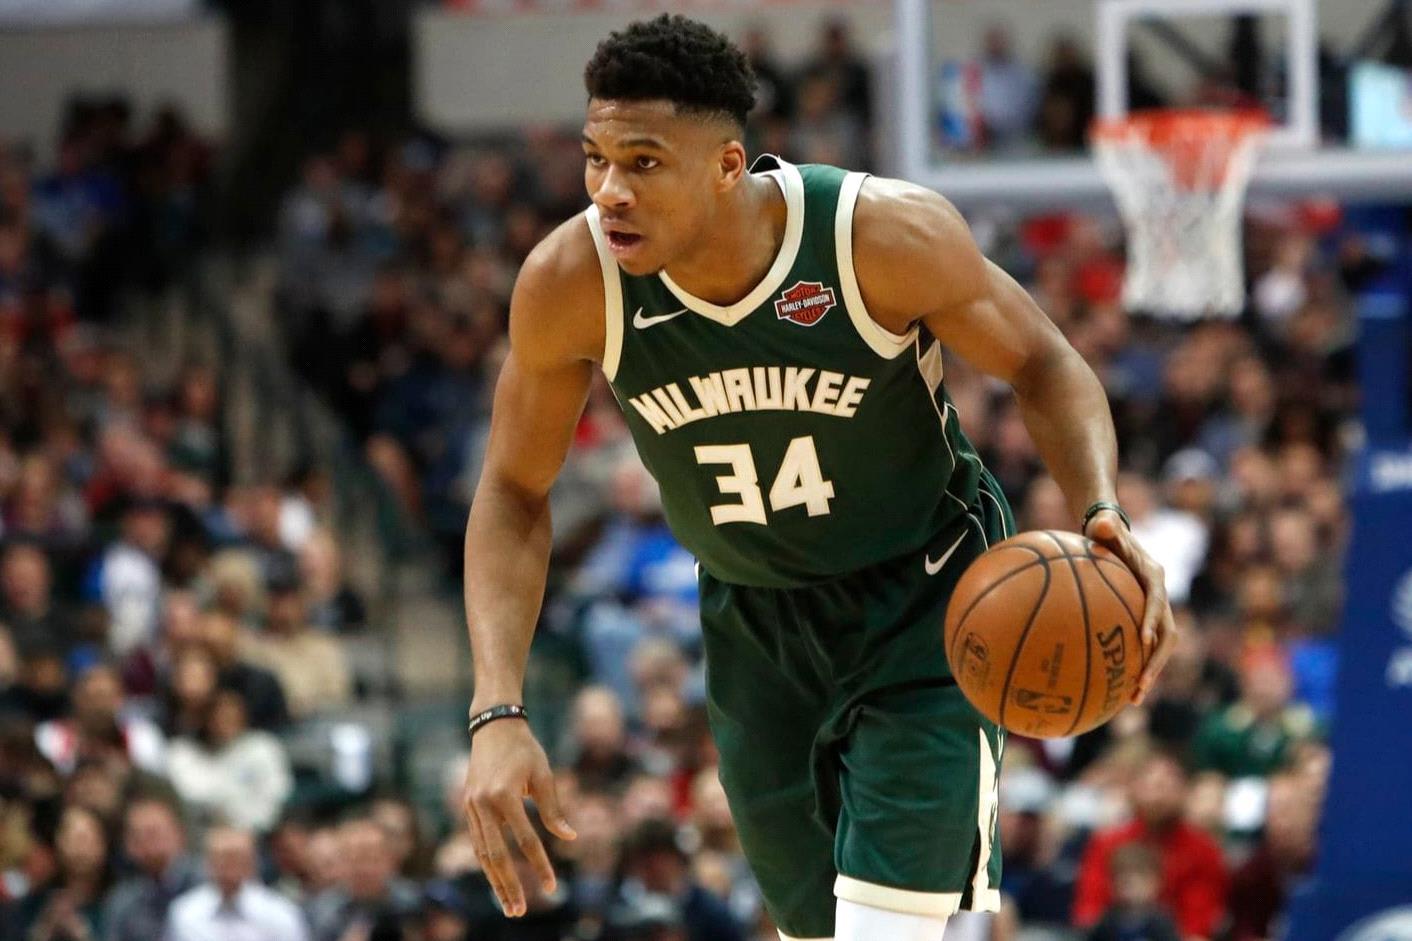 Superstar basketball player from Milwaukee